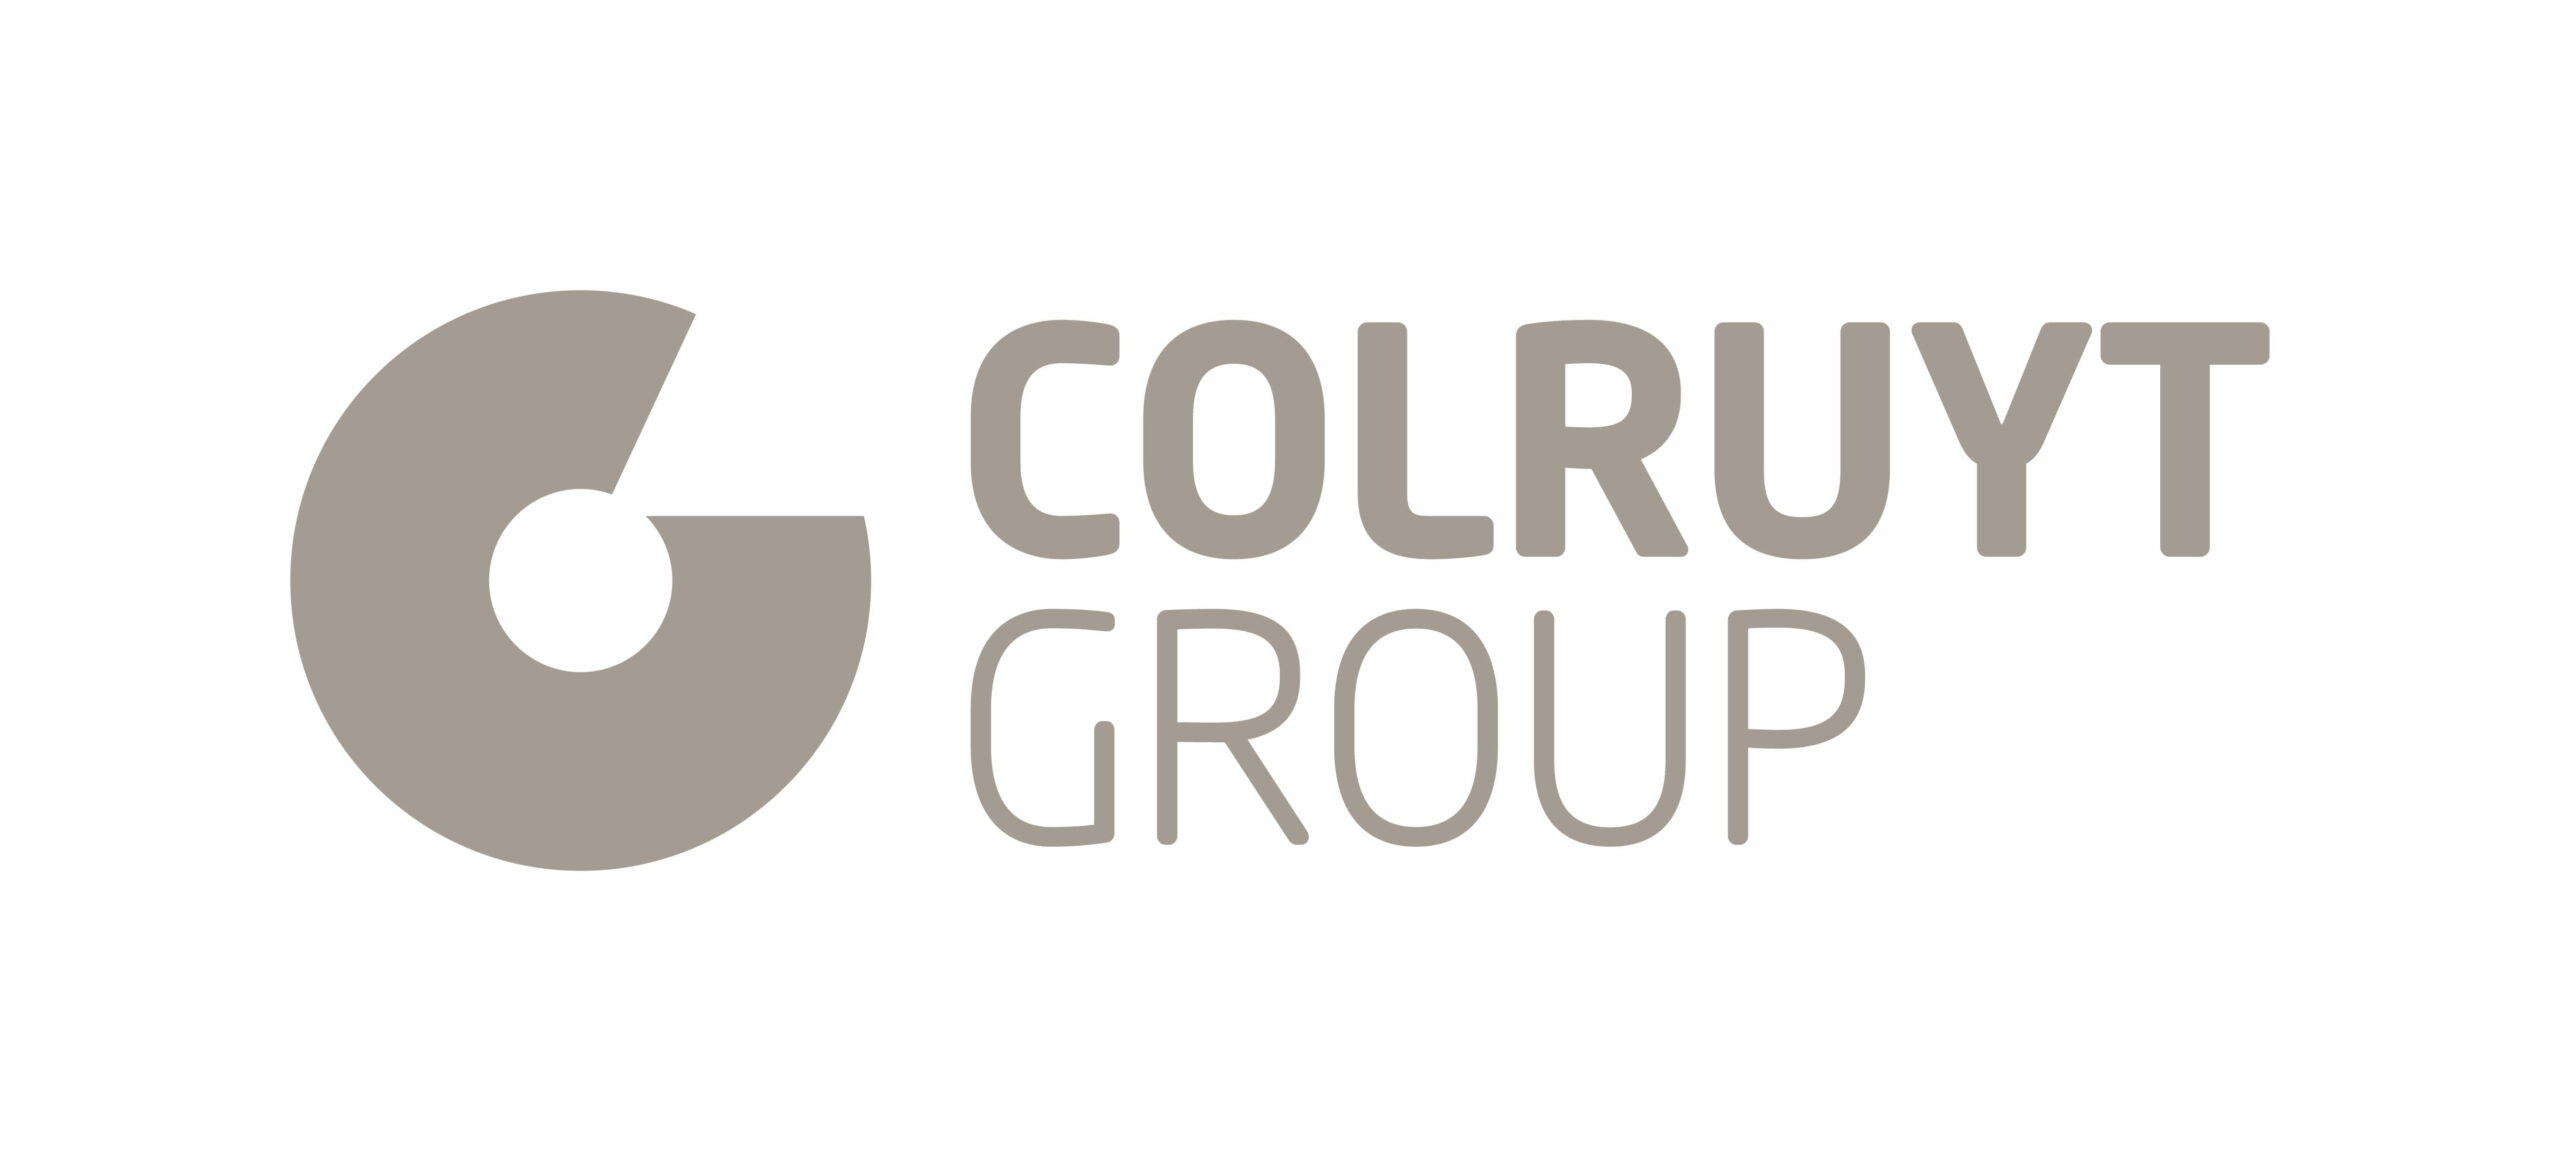 Colruytgroup - fond blanc